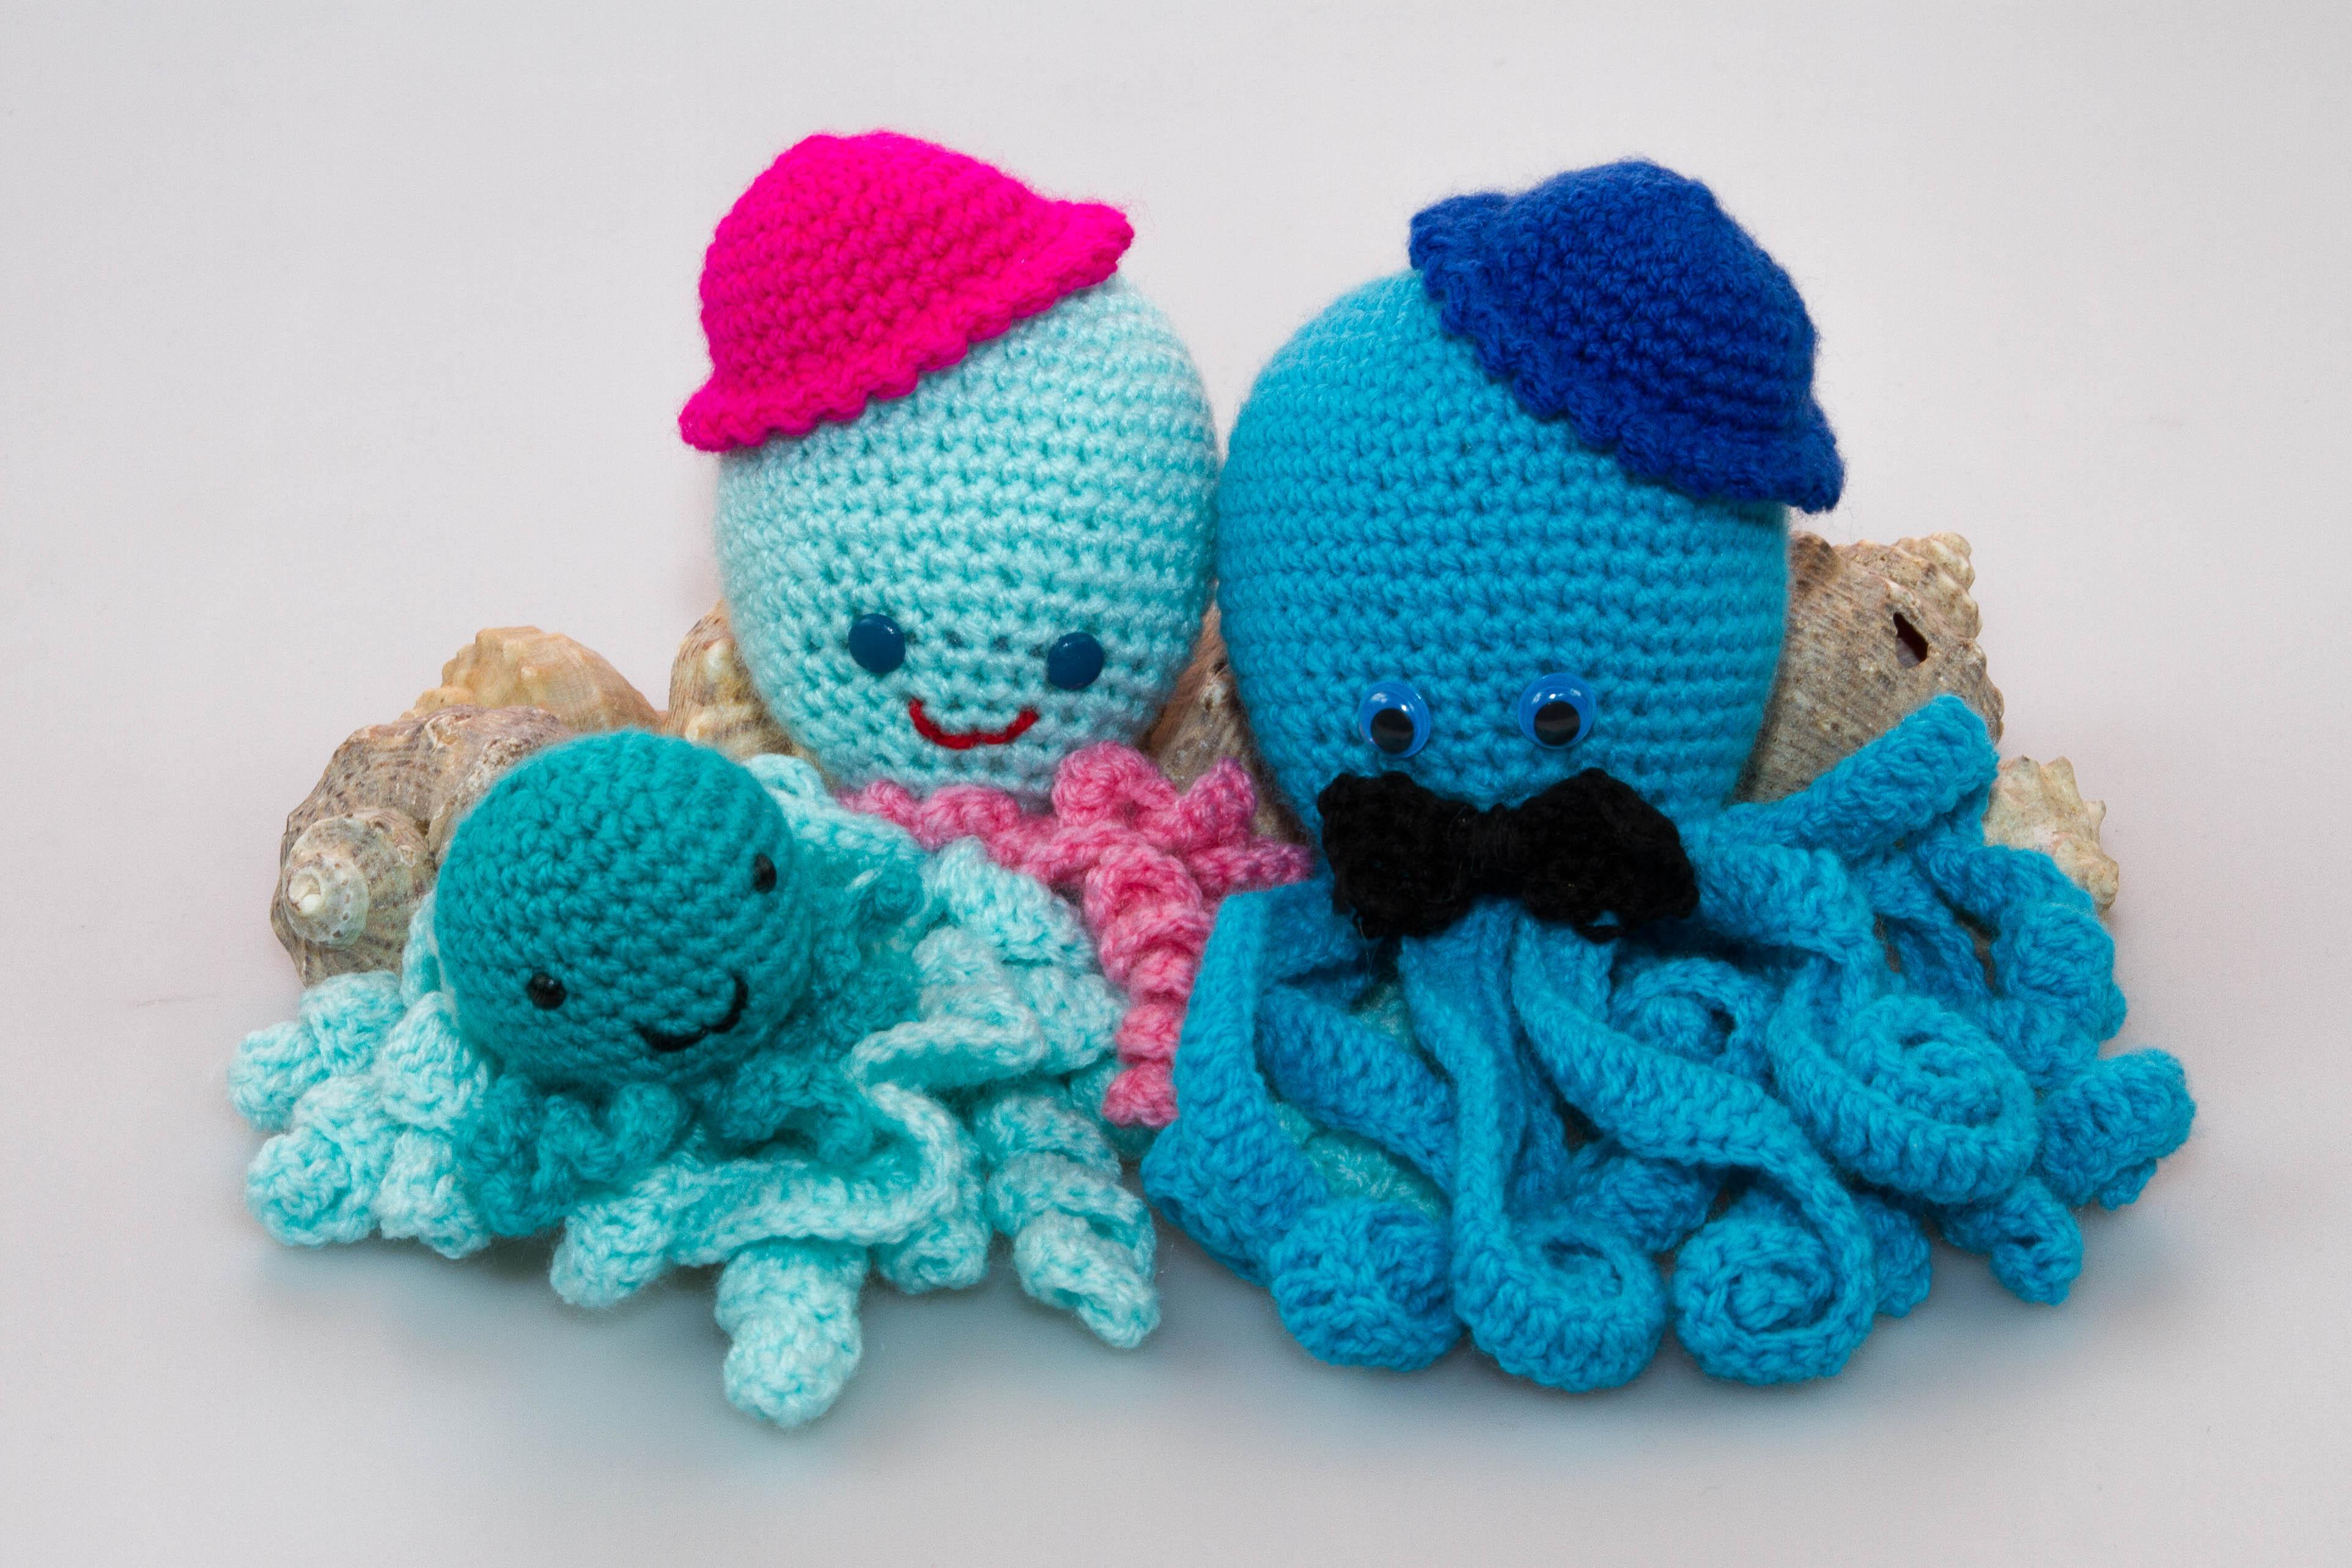 Free Crochet Pattern for Amigurumi Octopus ⋆ Crochet Kingdom | 2565x3847